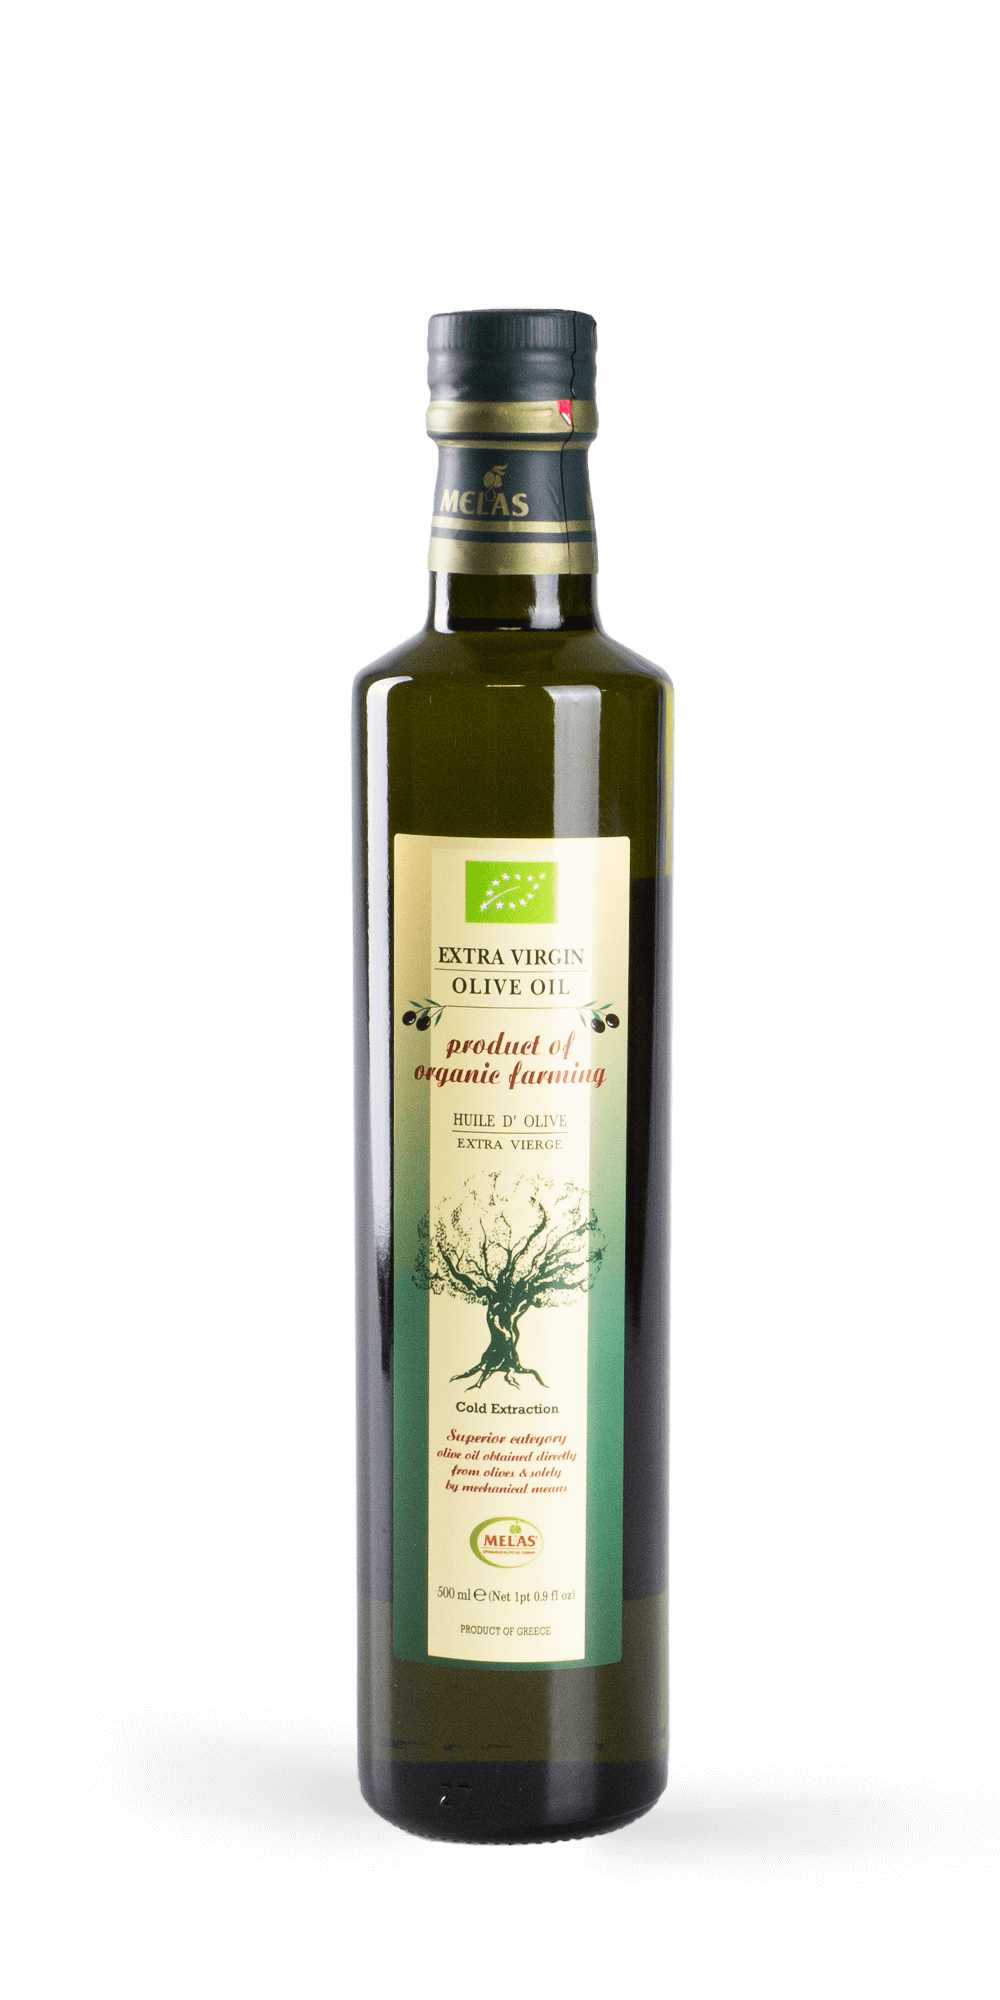 Melas Olivenöl BIO 0,5 l